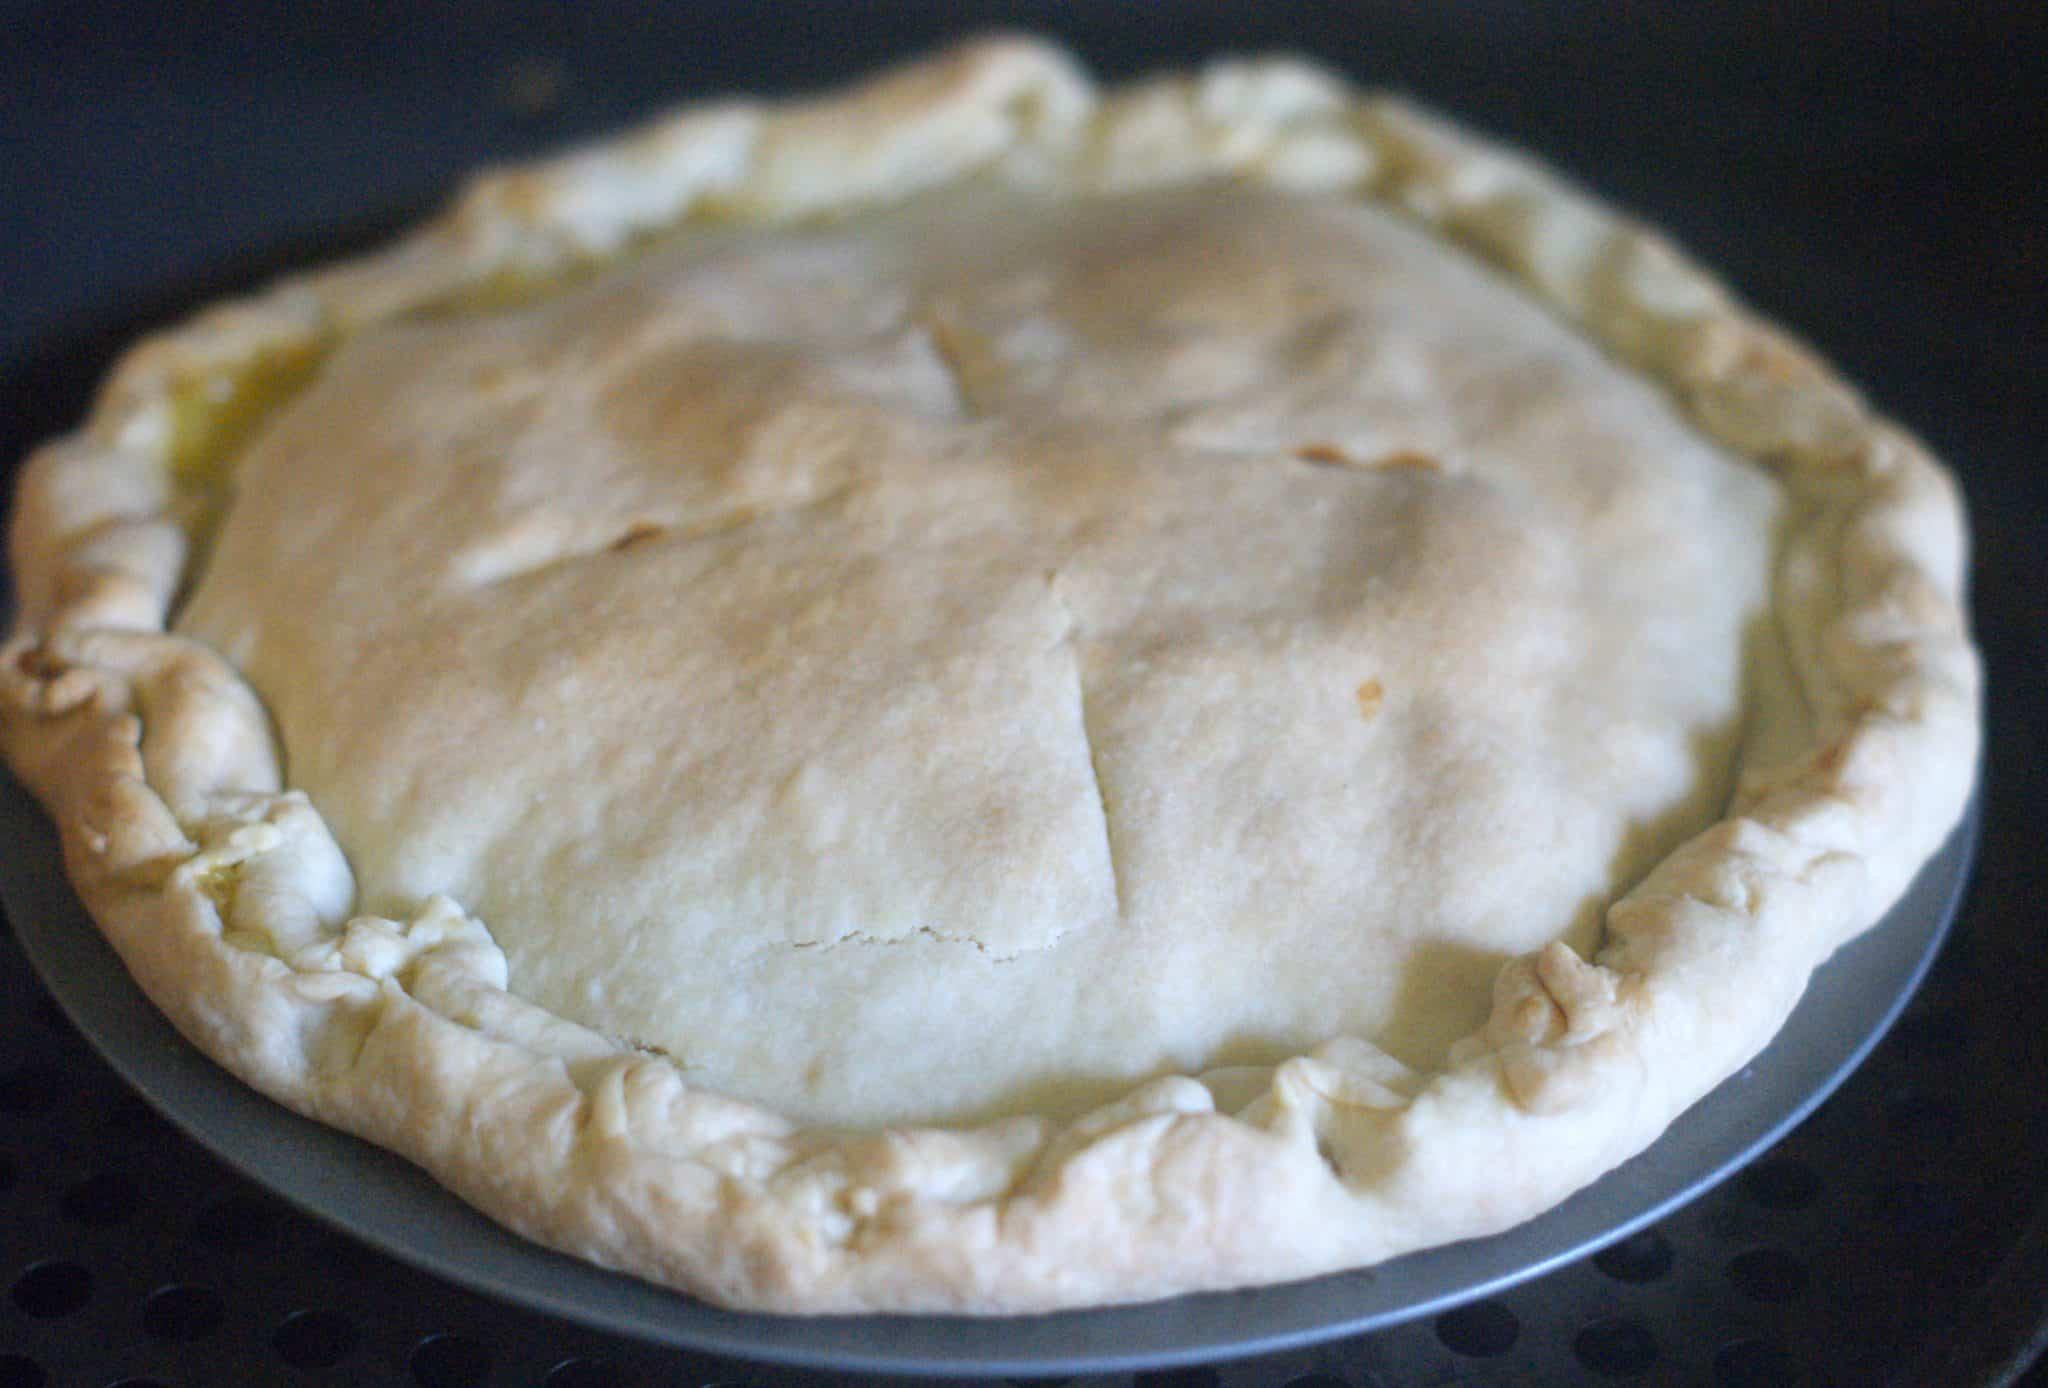 Cooked homemade chicken pot pie - #dinner #recipe #chickenpotpie #easyrecipe  #mealplan #freezercooking #mealprep #chickenrecipe